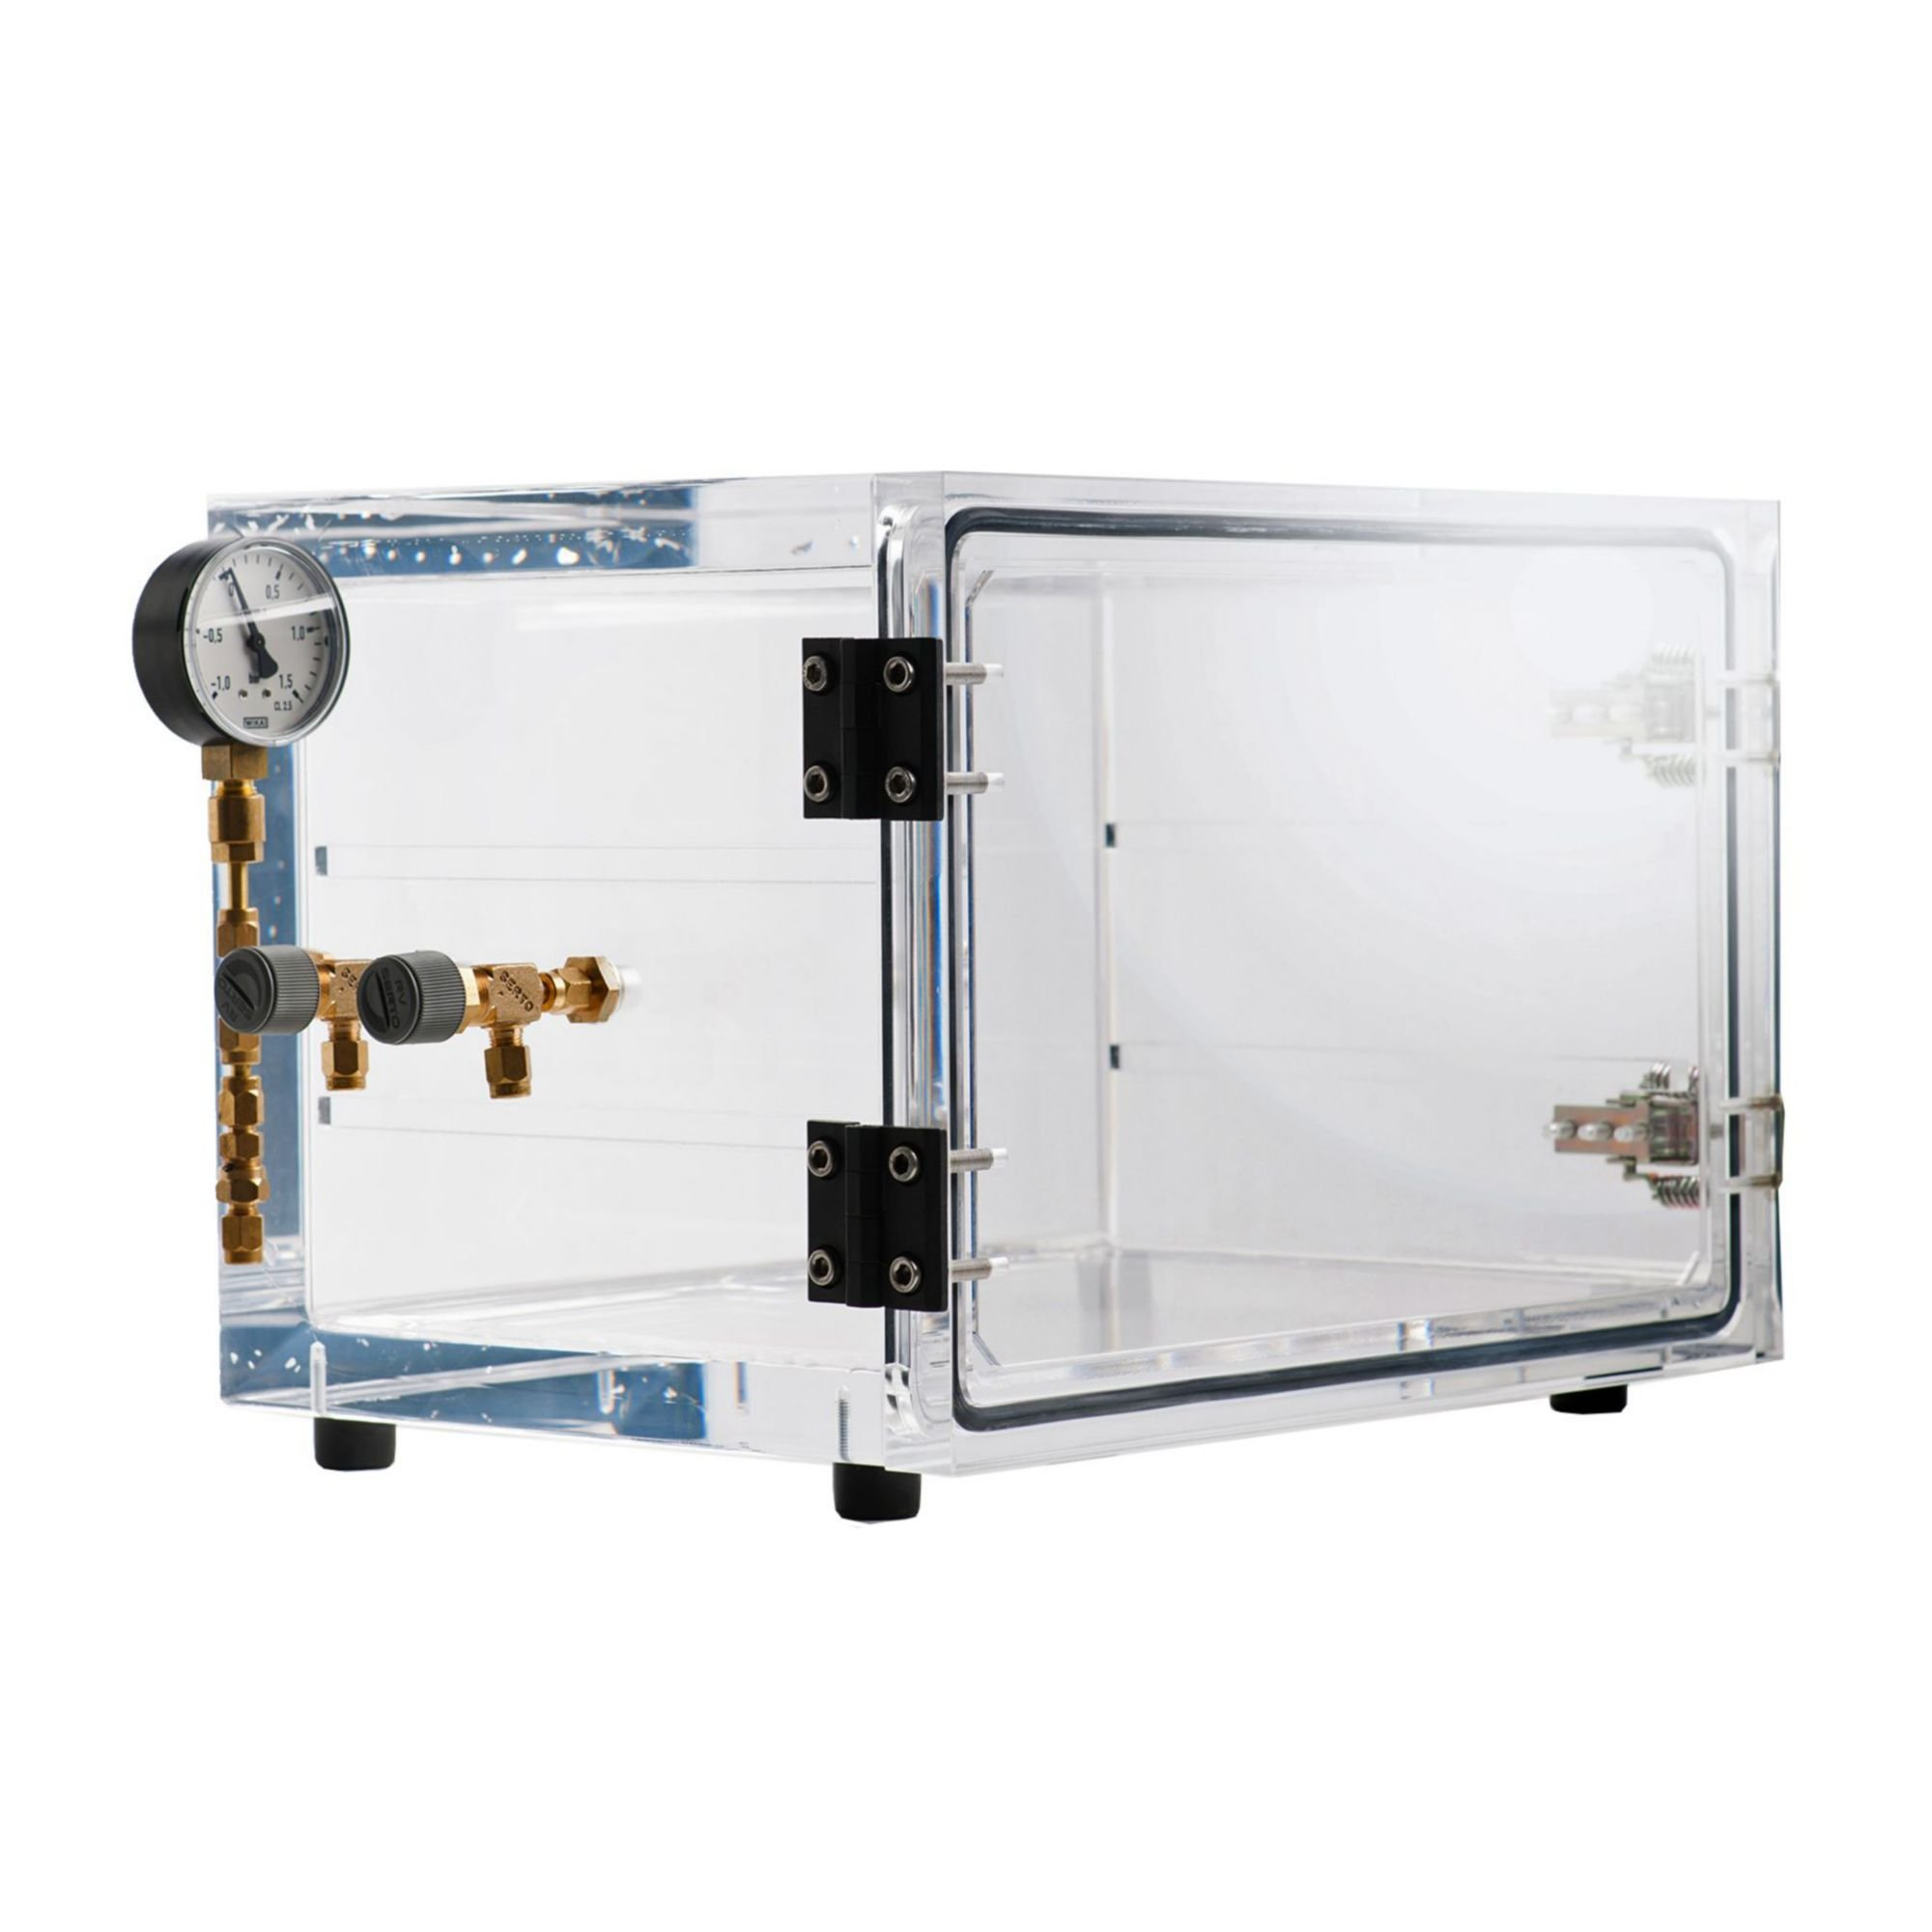 Exsikkator / Desiccator aus Acrylglas